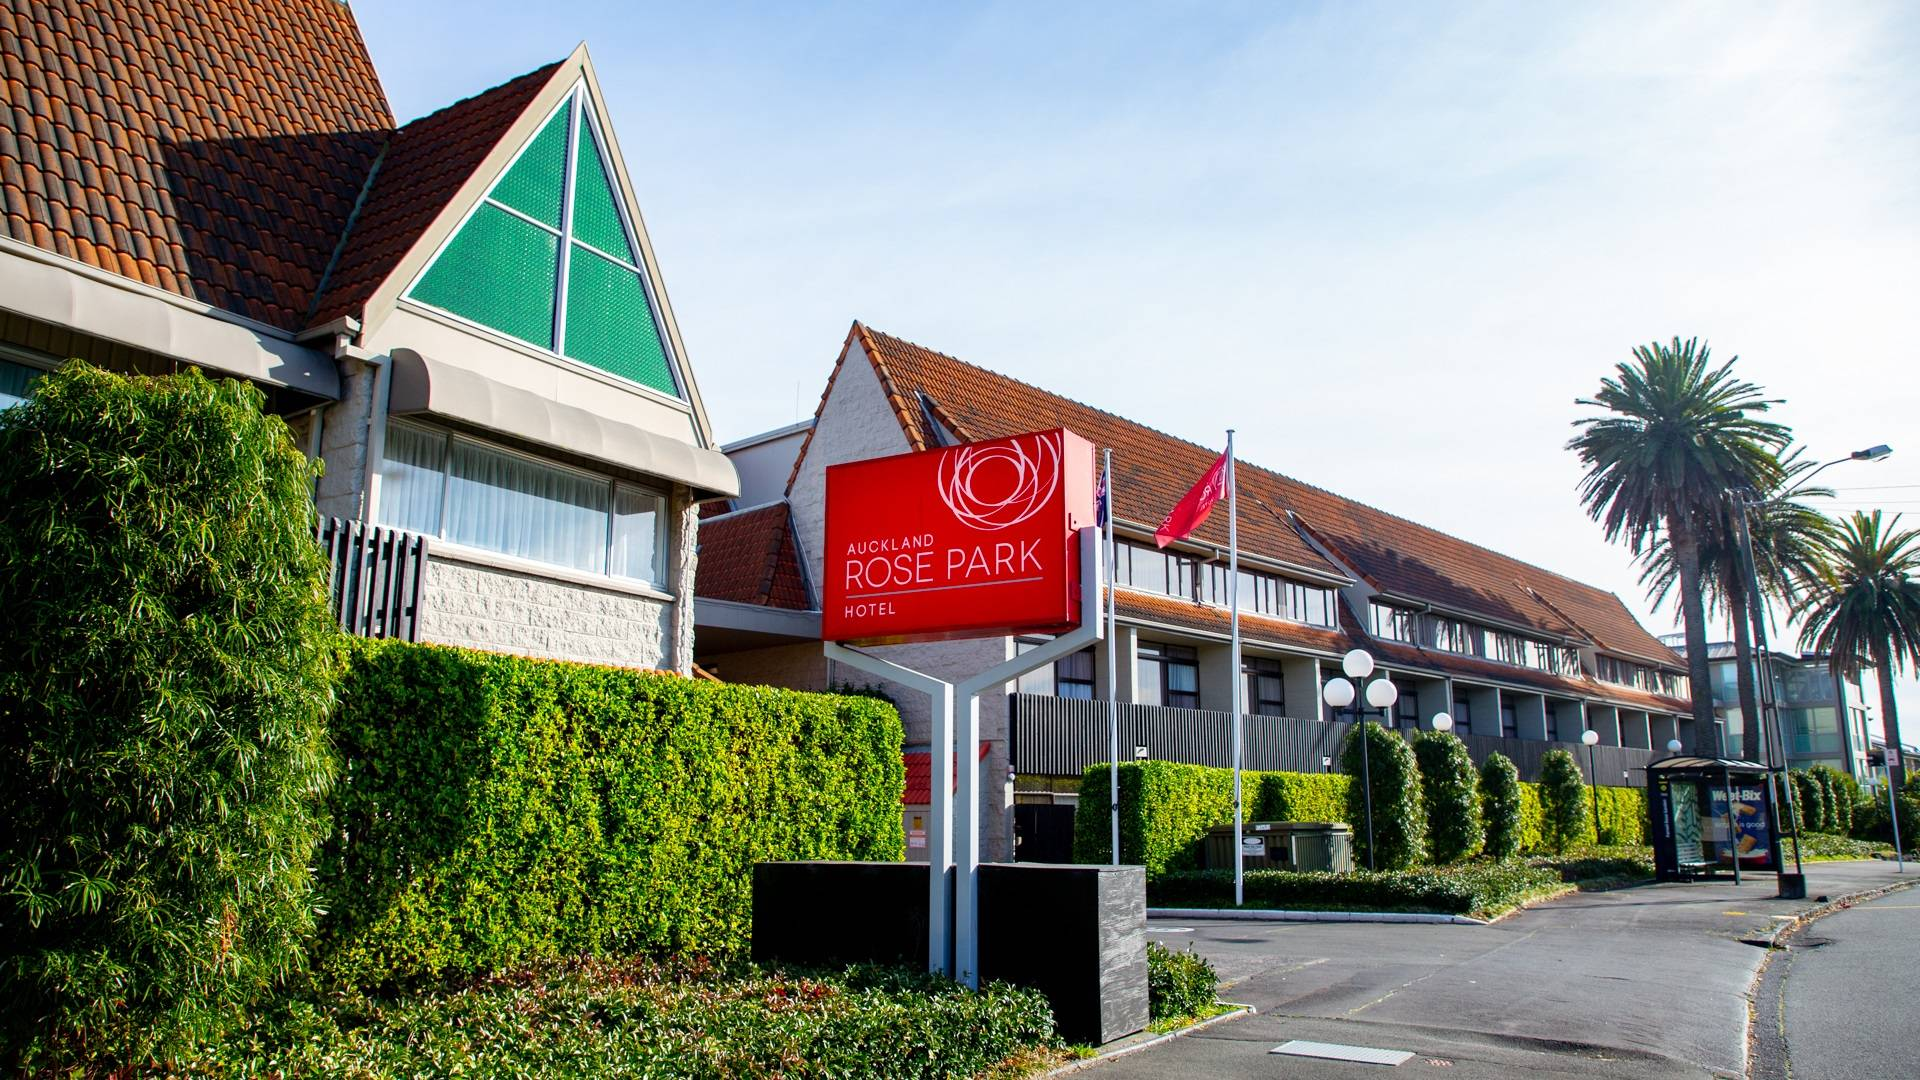 Auckland Rose Park Hotel Exterior